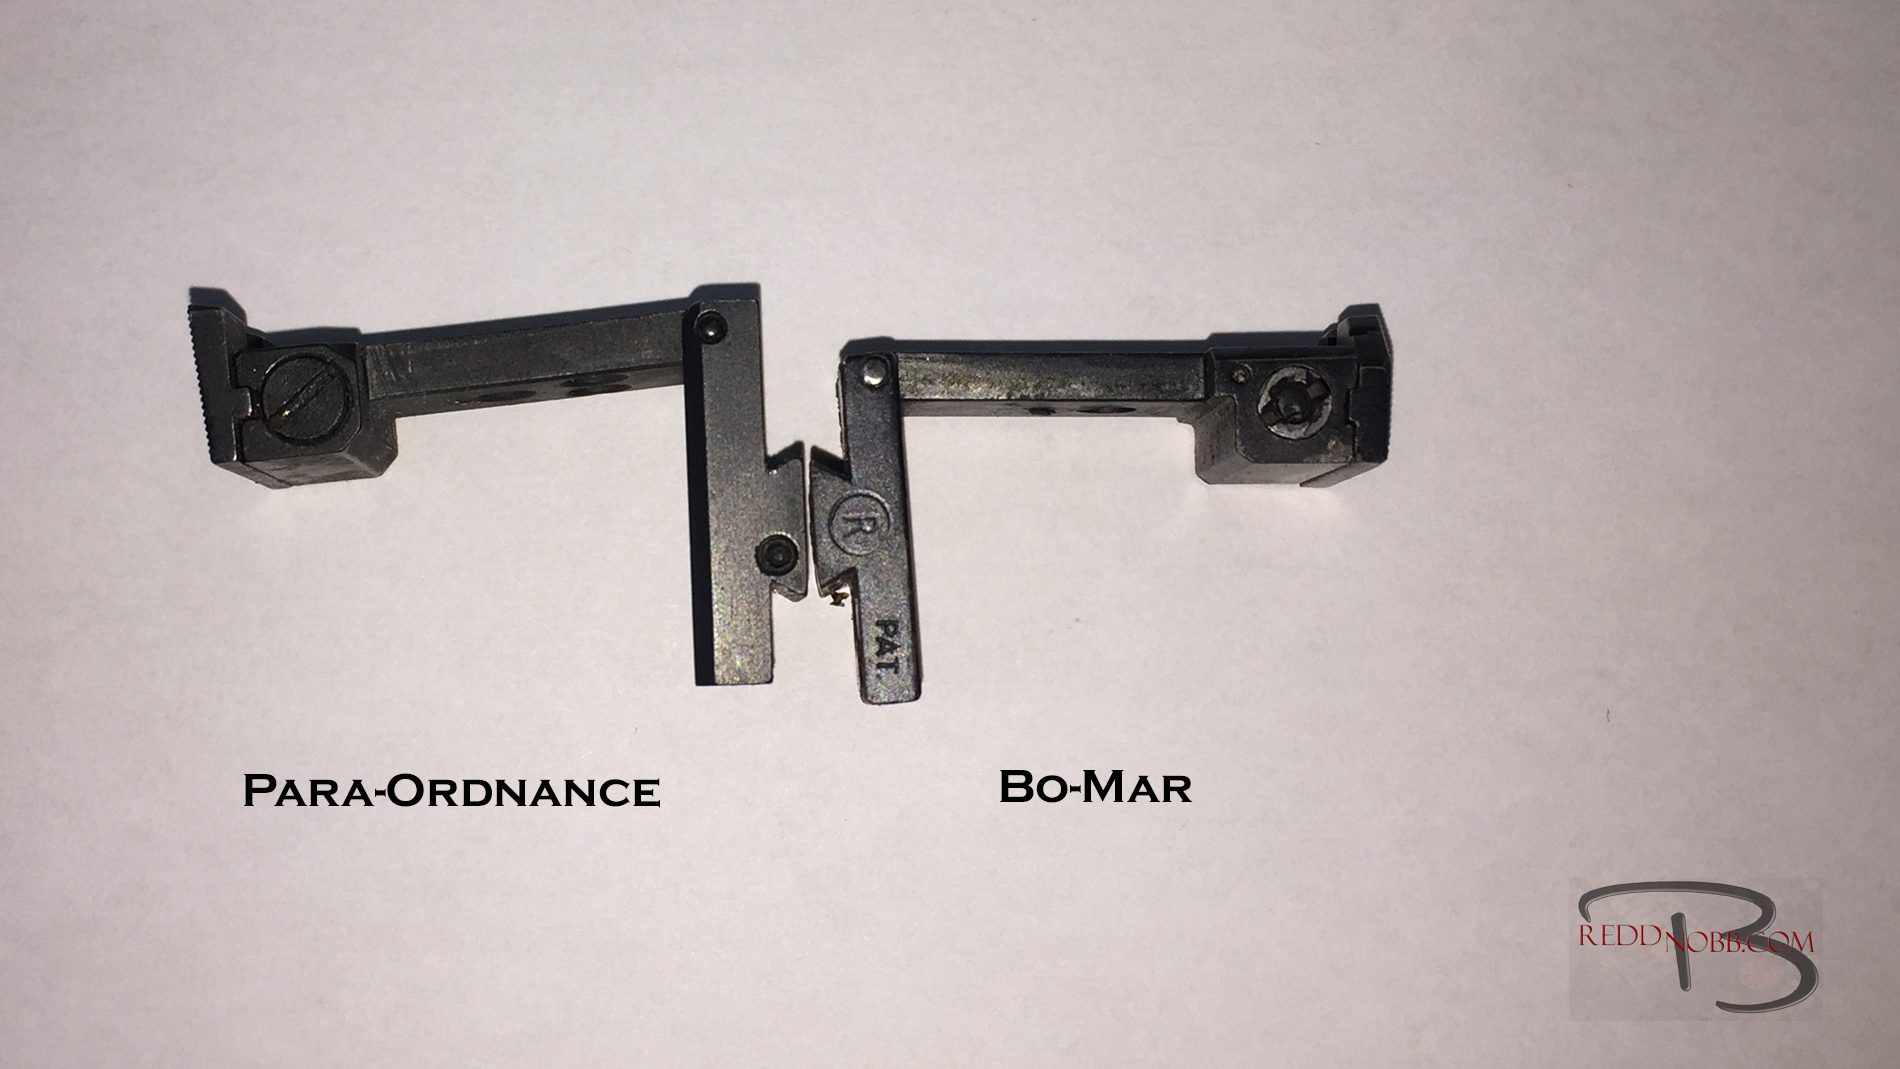 Para-Ord vs Bo-Mar